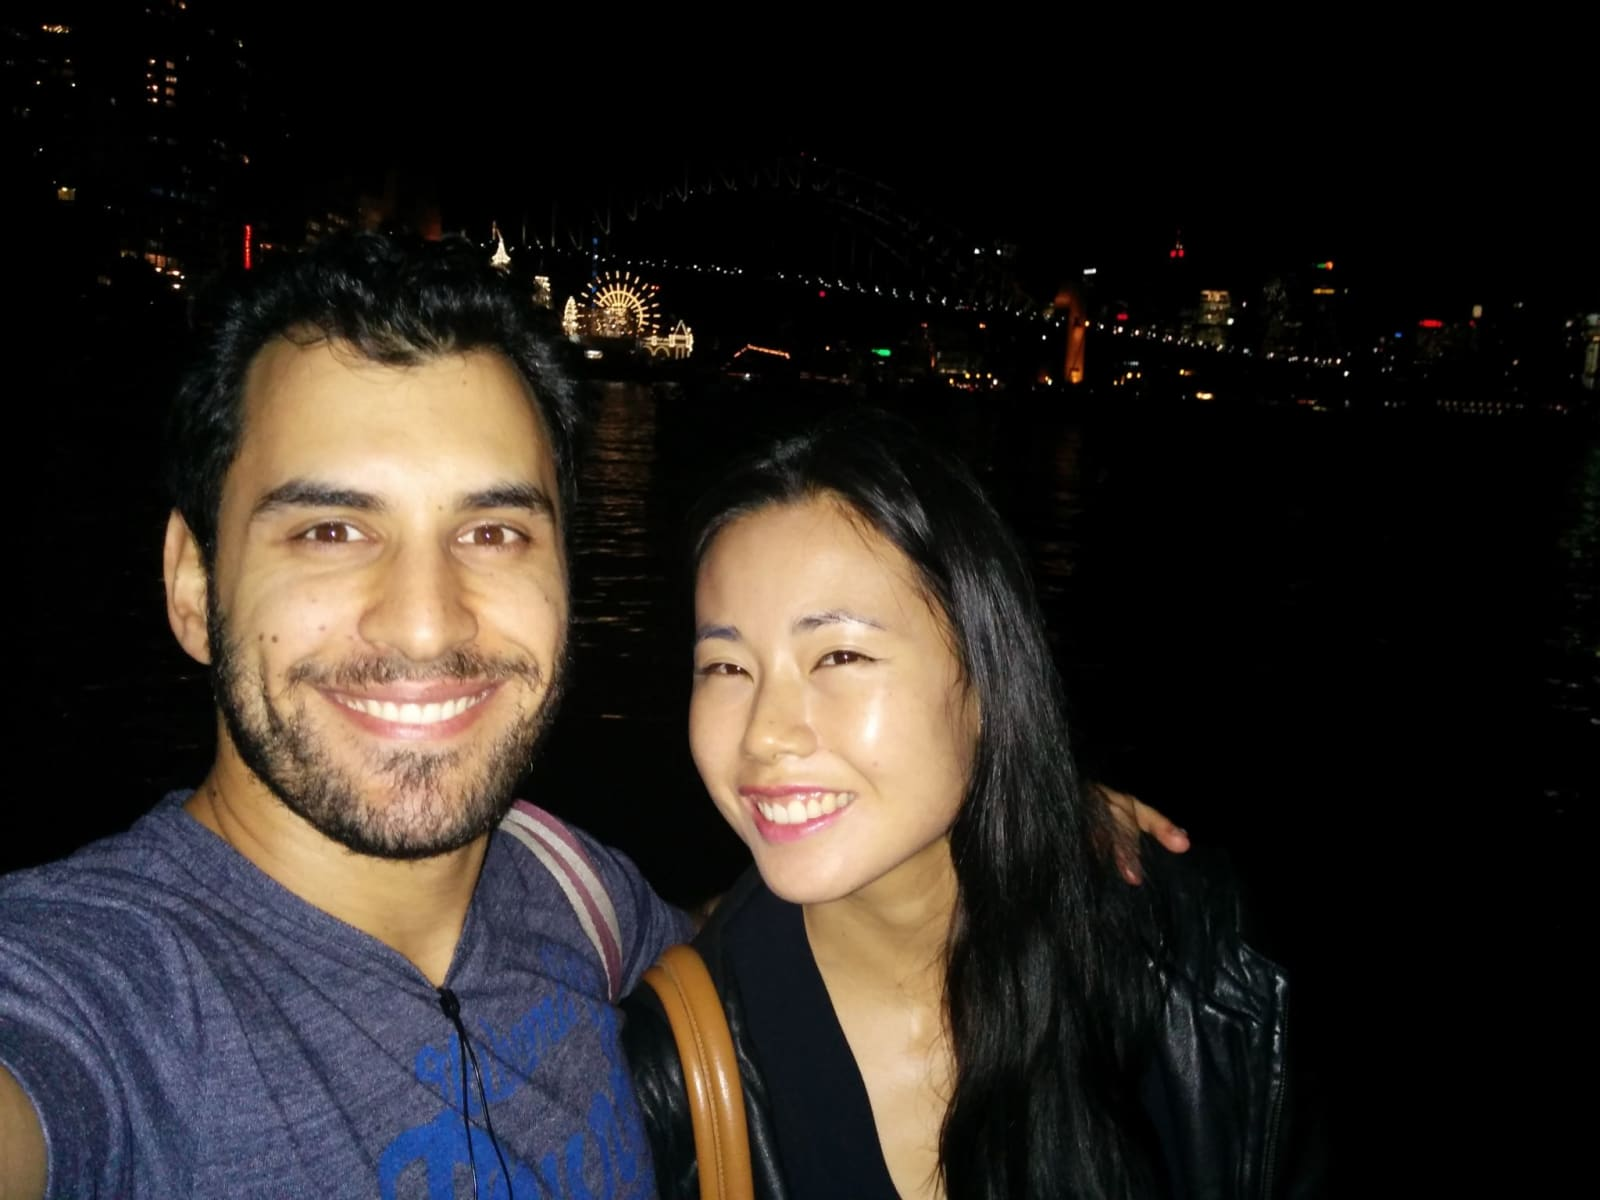 Adrian & Sarah from London, United Kingdom